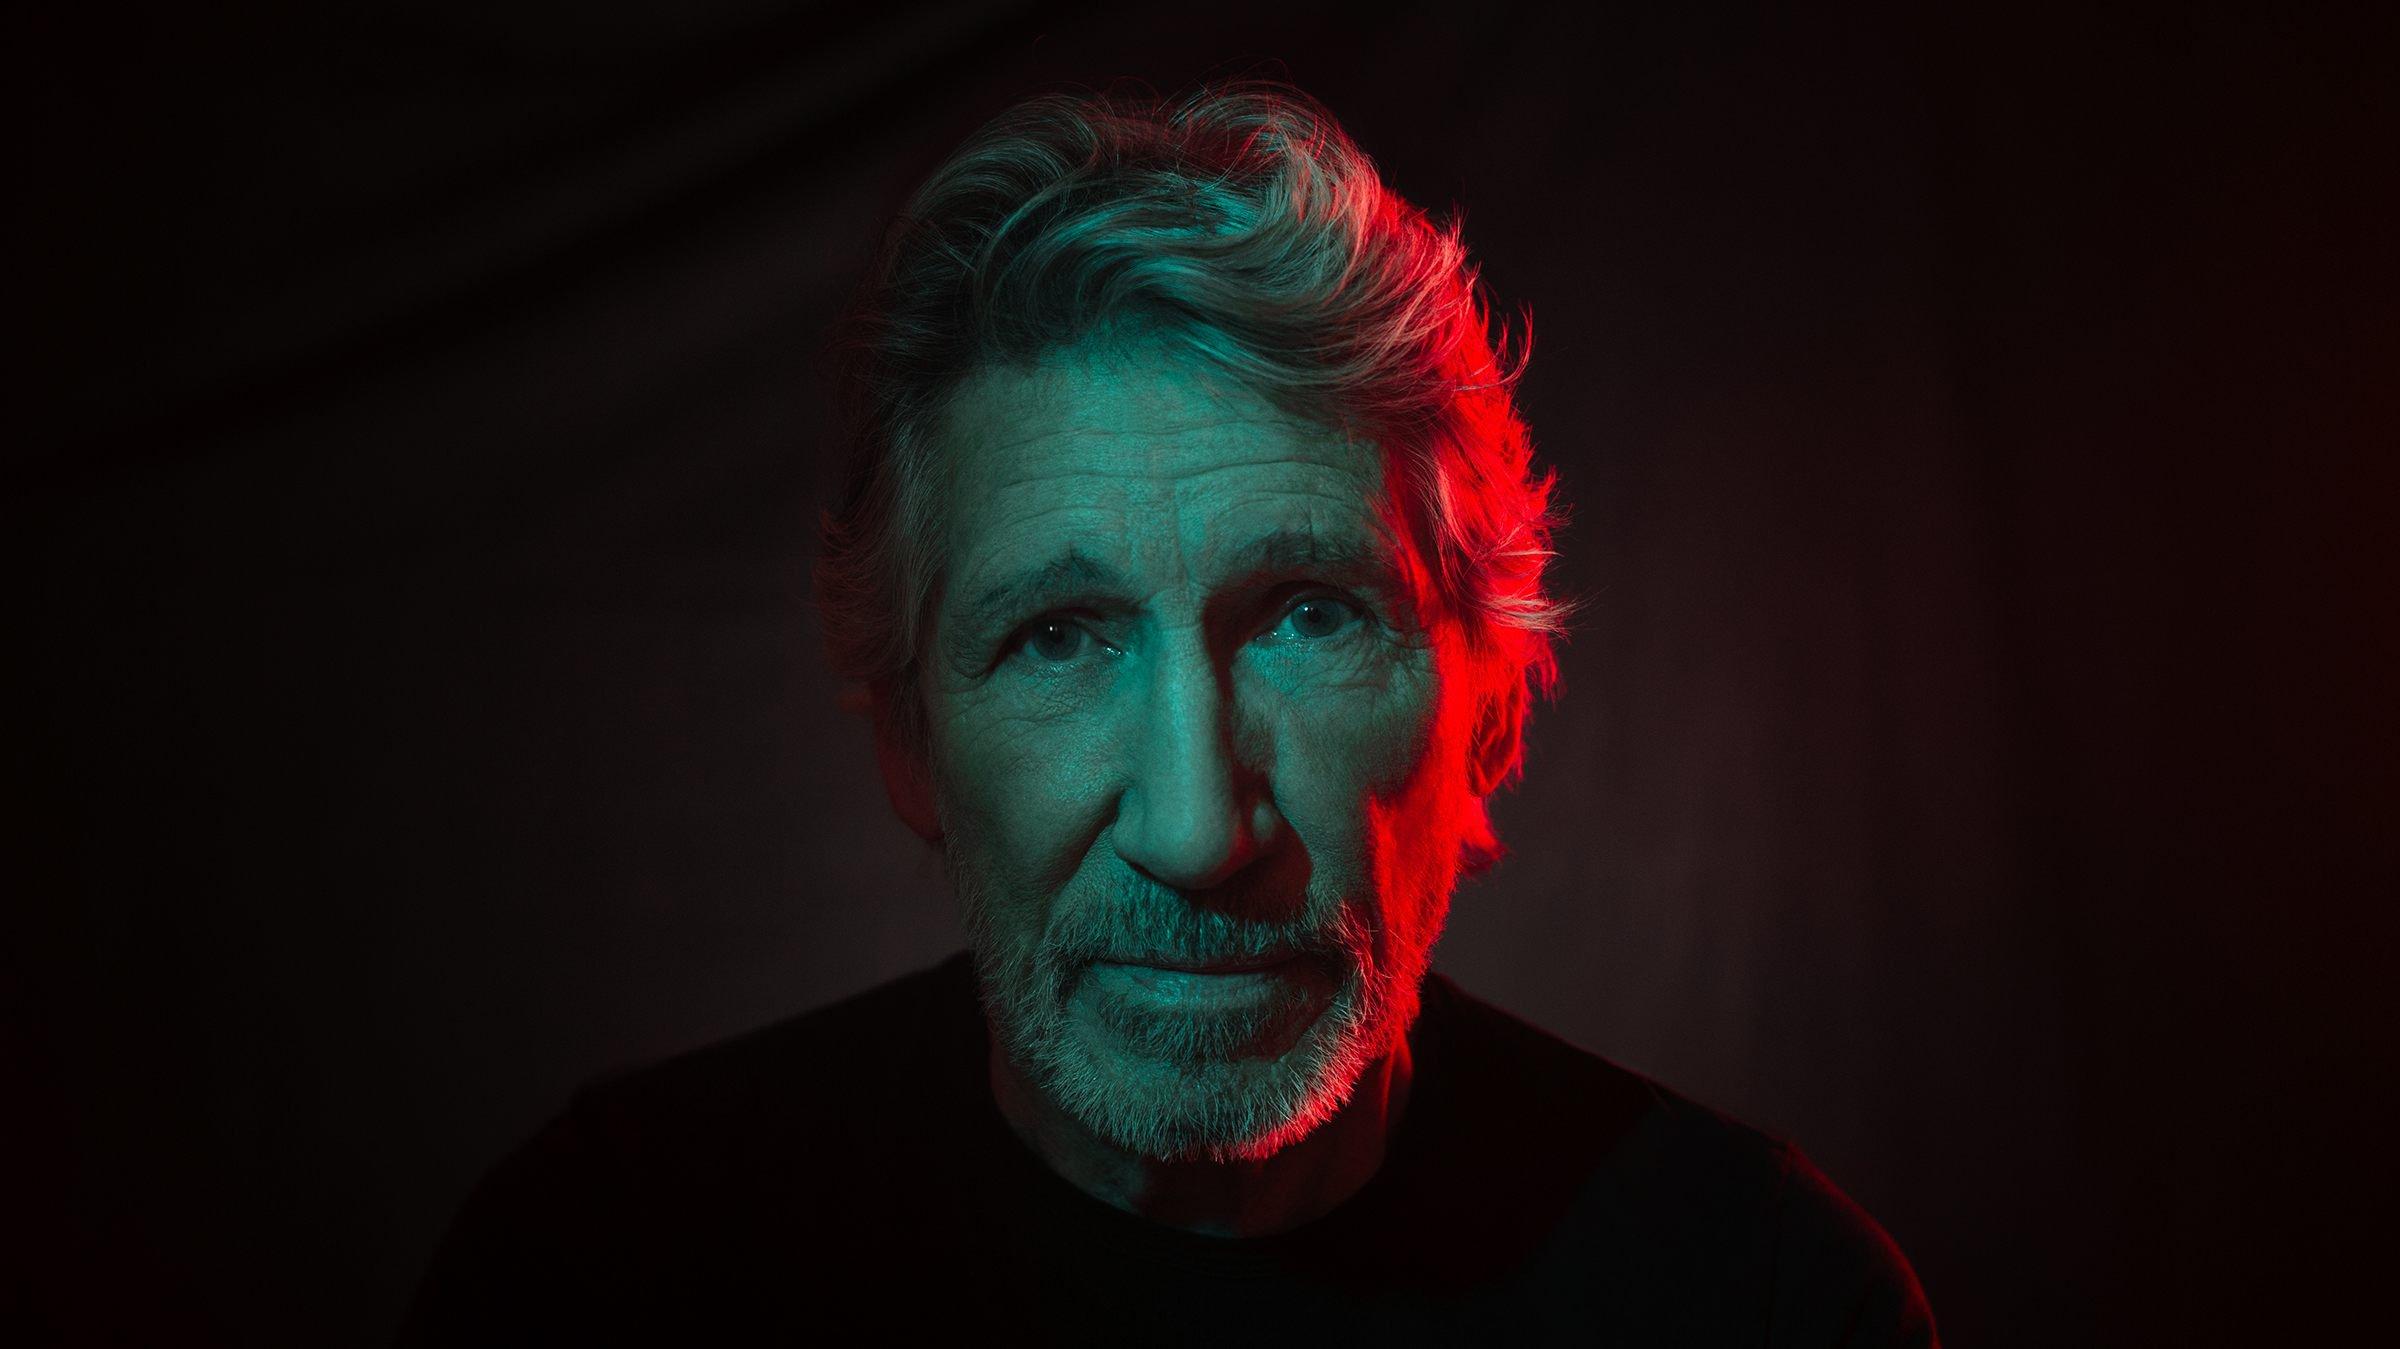 Roger-Waters-anuncia-tour-norteamerica-2020.jpg